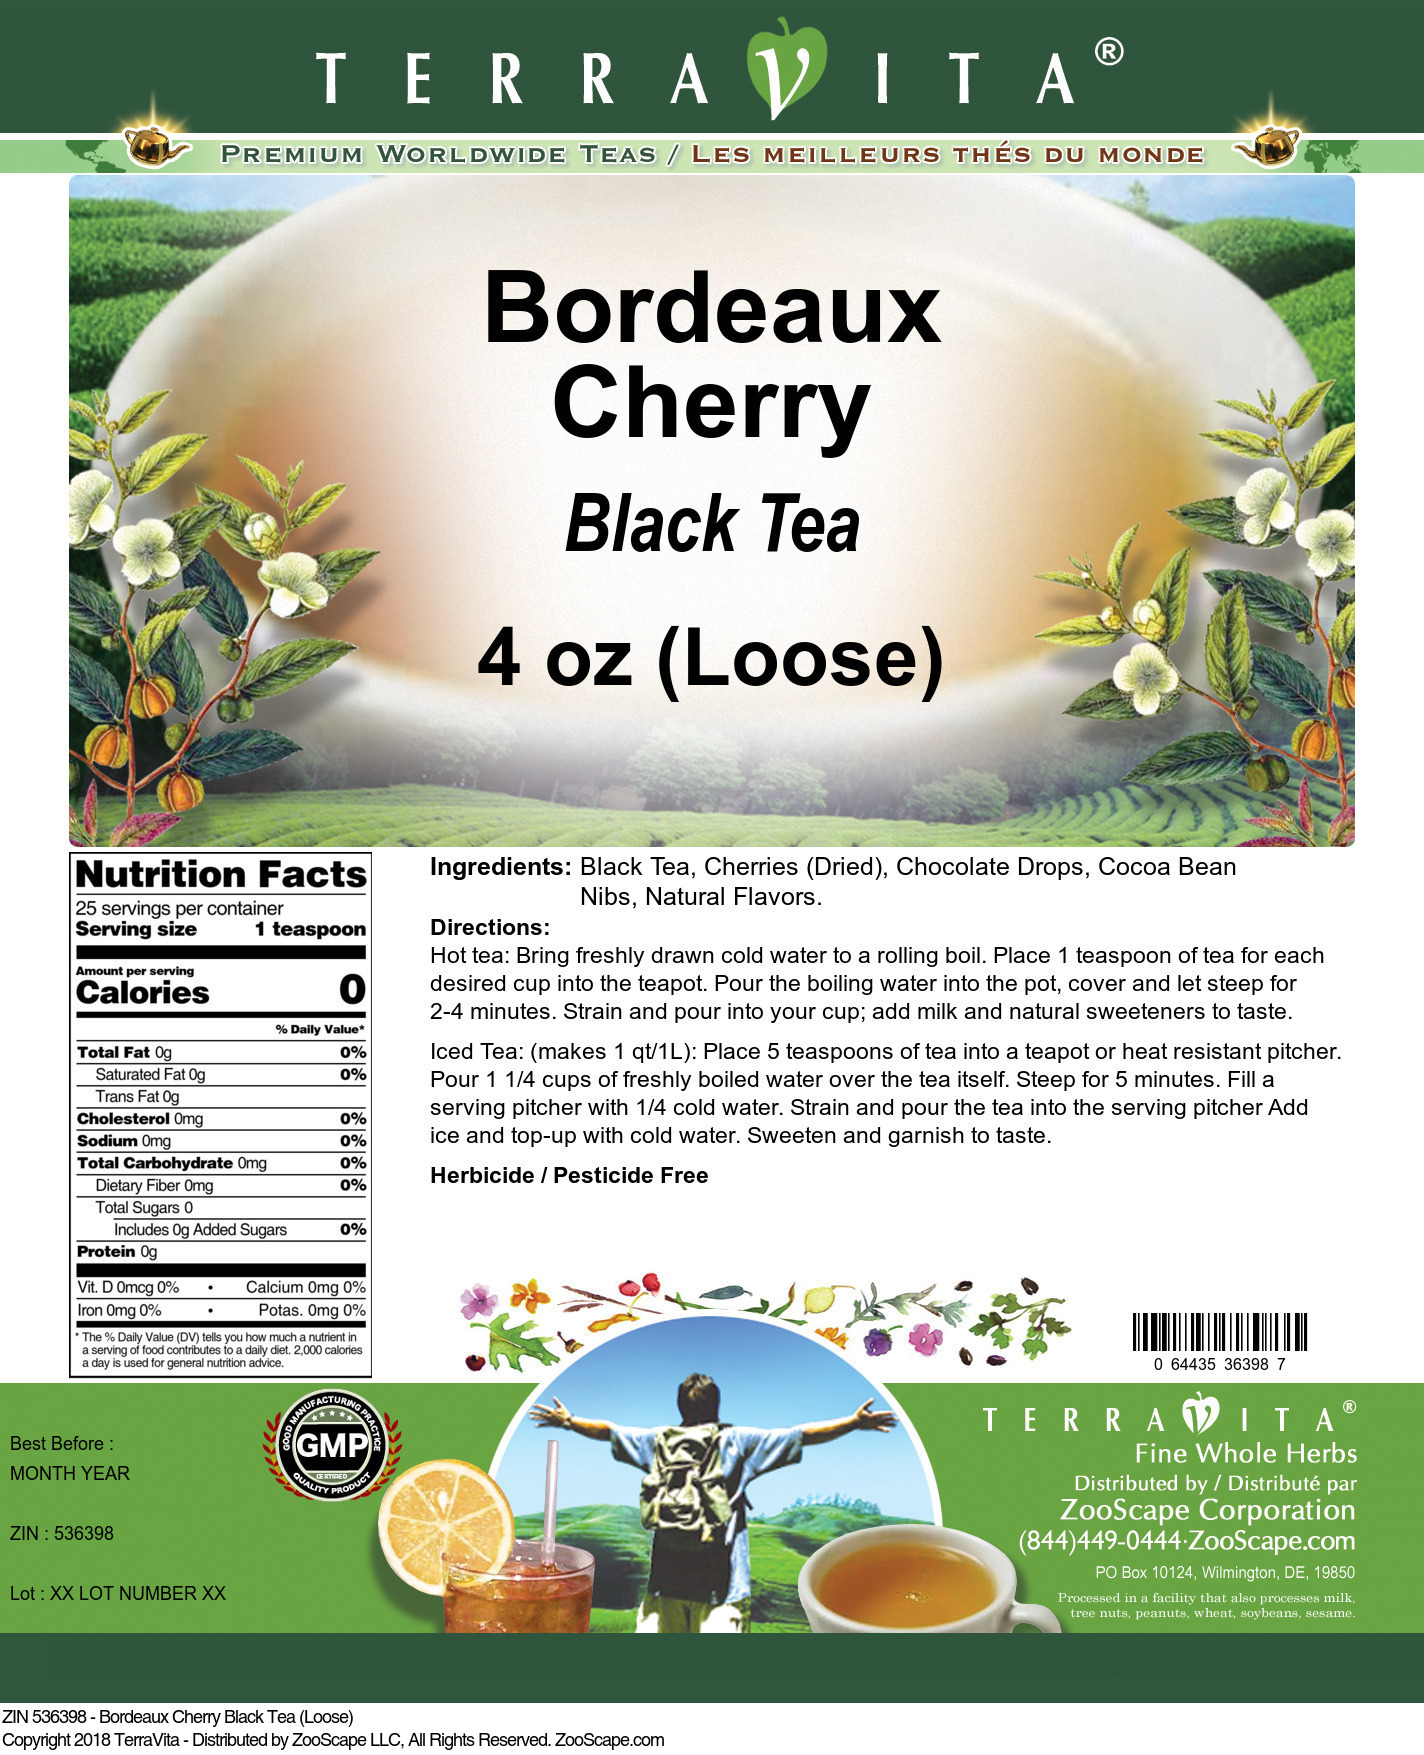 Bordeaux Cherry Black Tea (Loose)